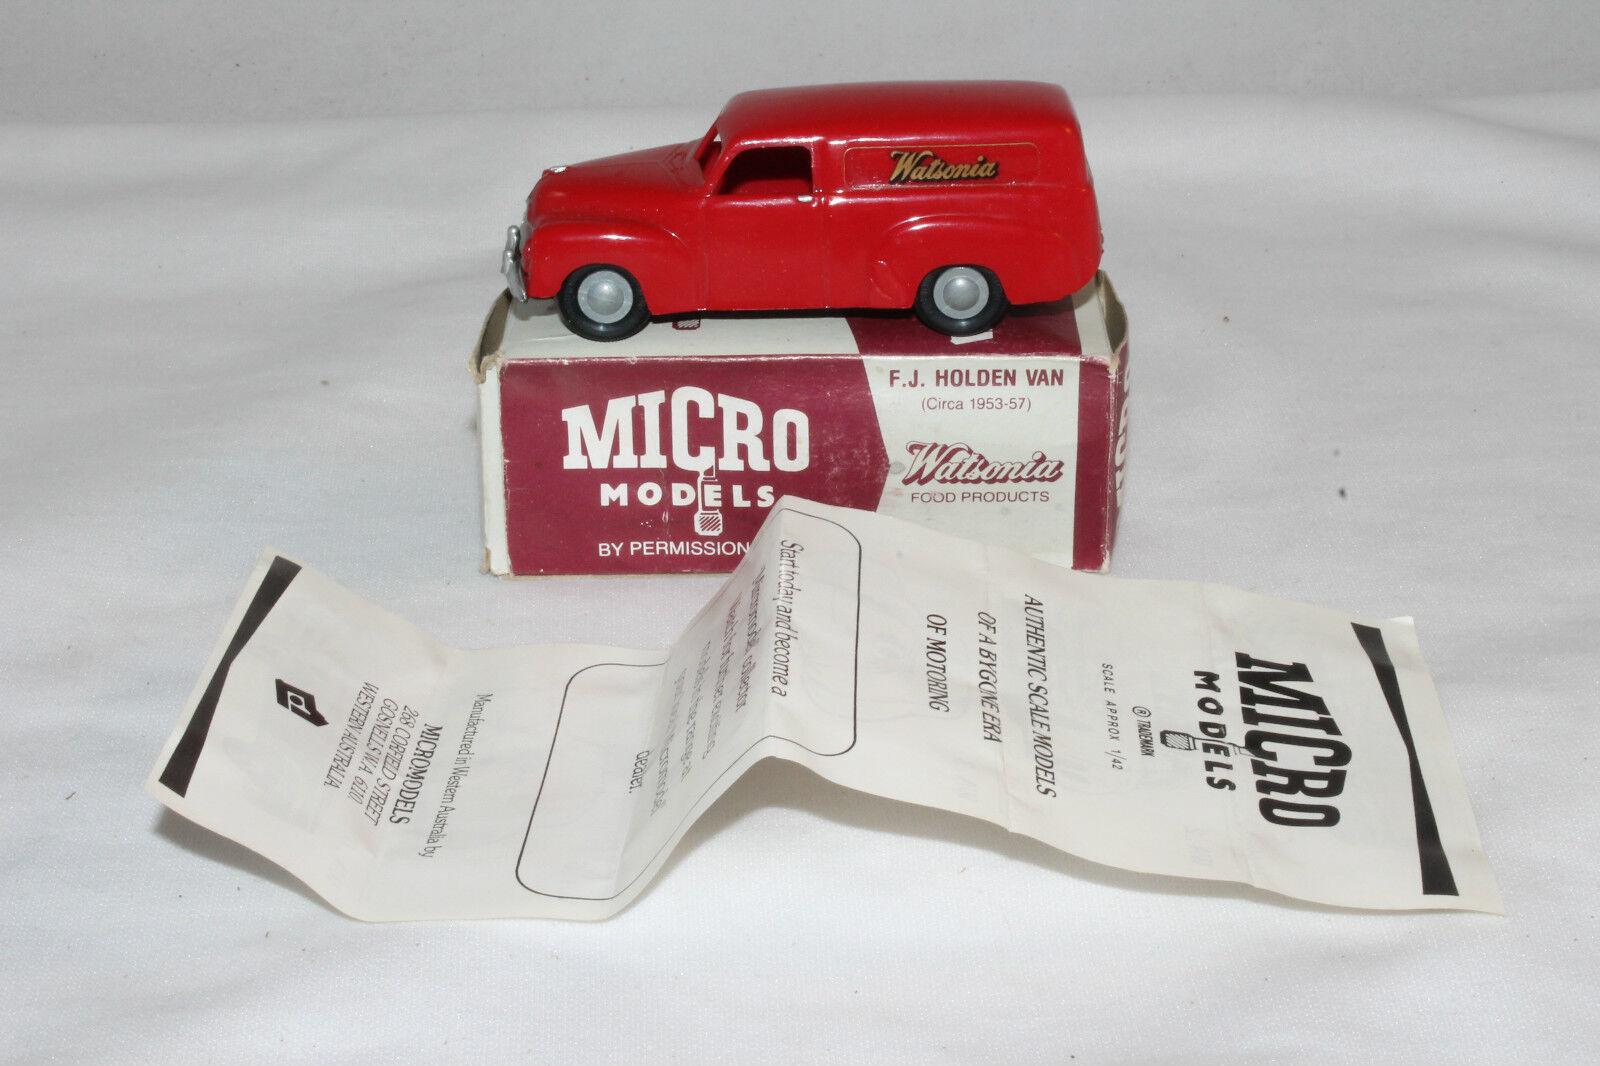 Micro Models  Wa-1 GM F. J. Holden Furgoneta, Watsonia,Plástico,Espectacular,